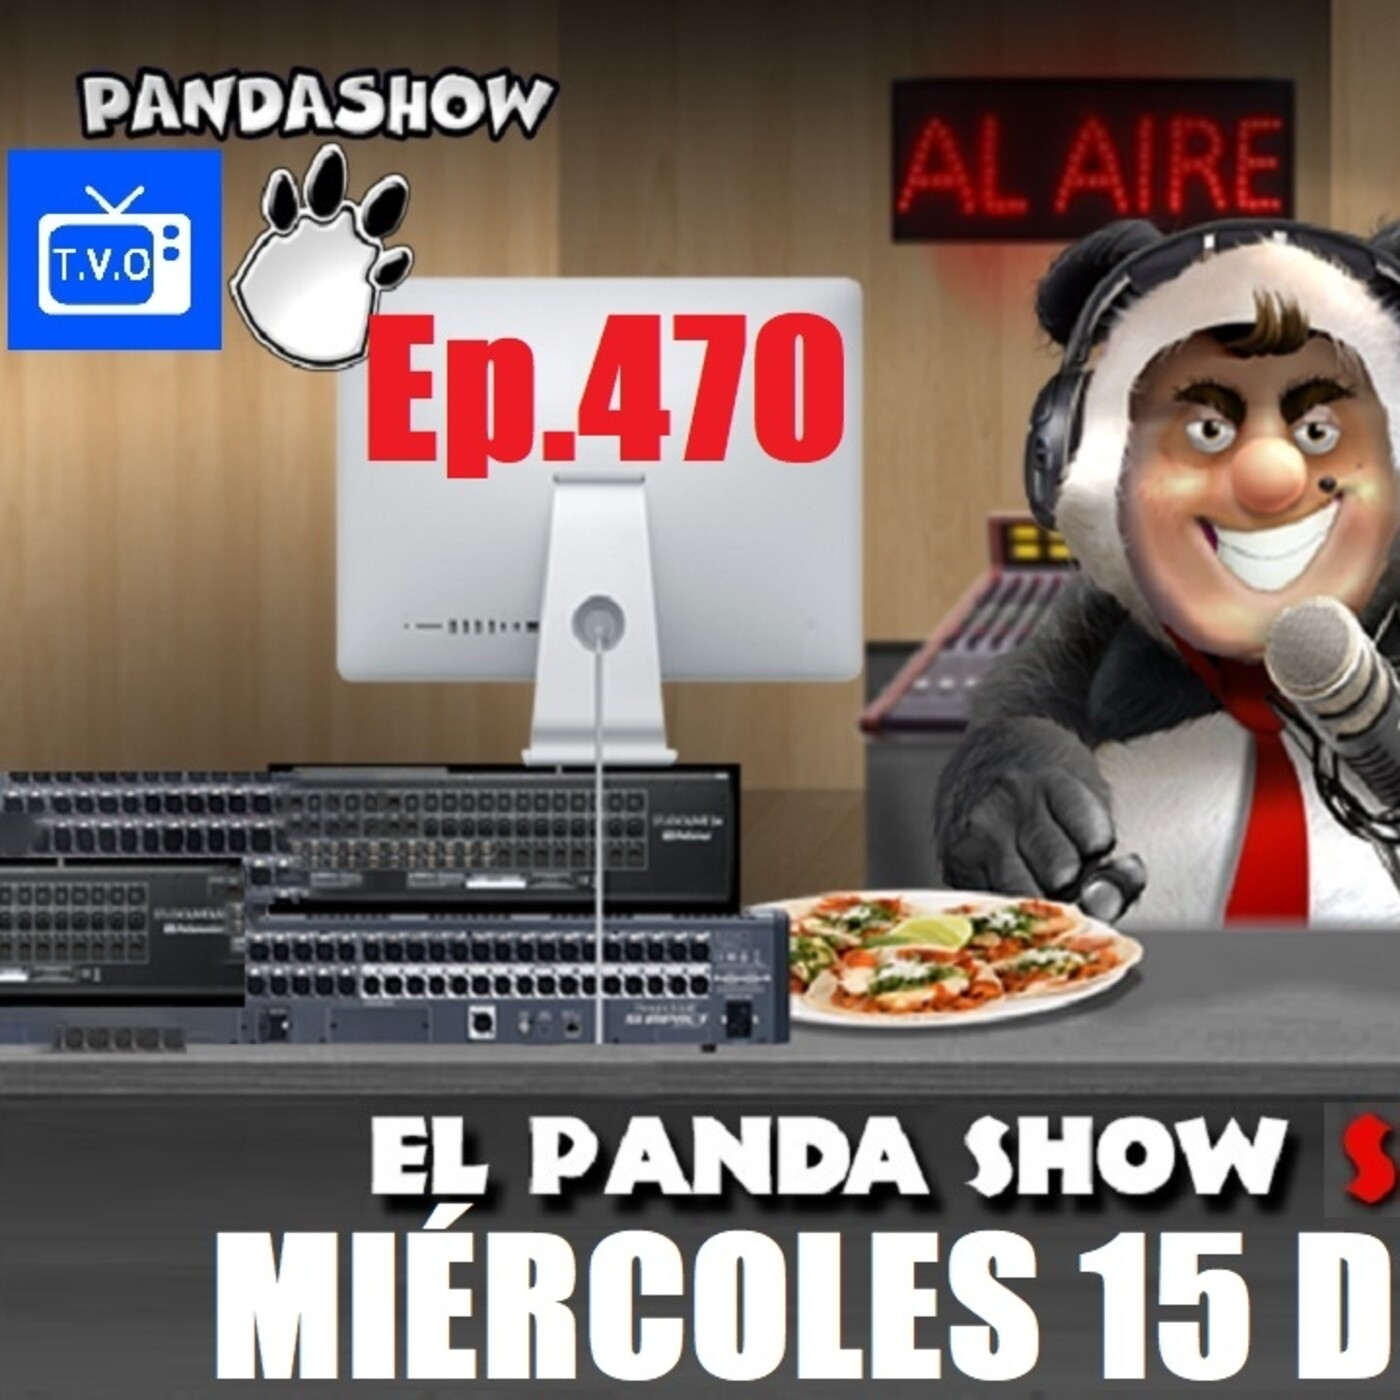 EL PANDA SHOW Ep. 470 MIÉRCOLES 15 DE JULIO 2020